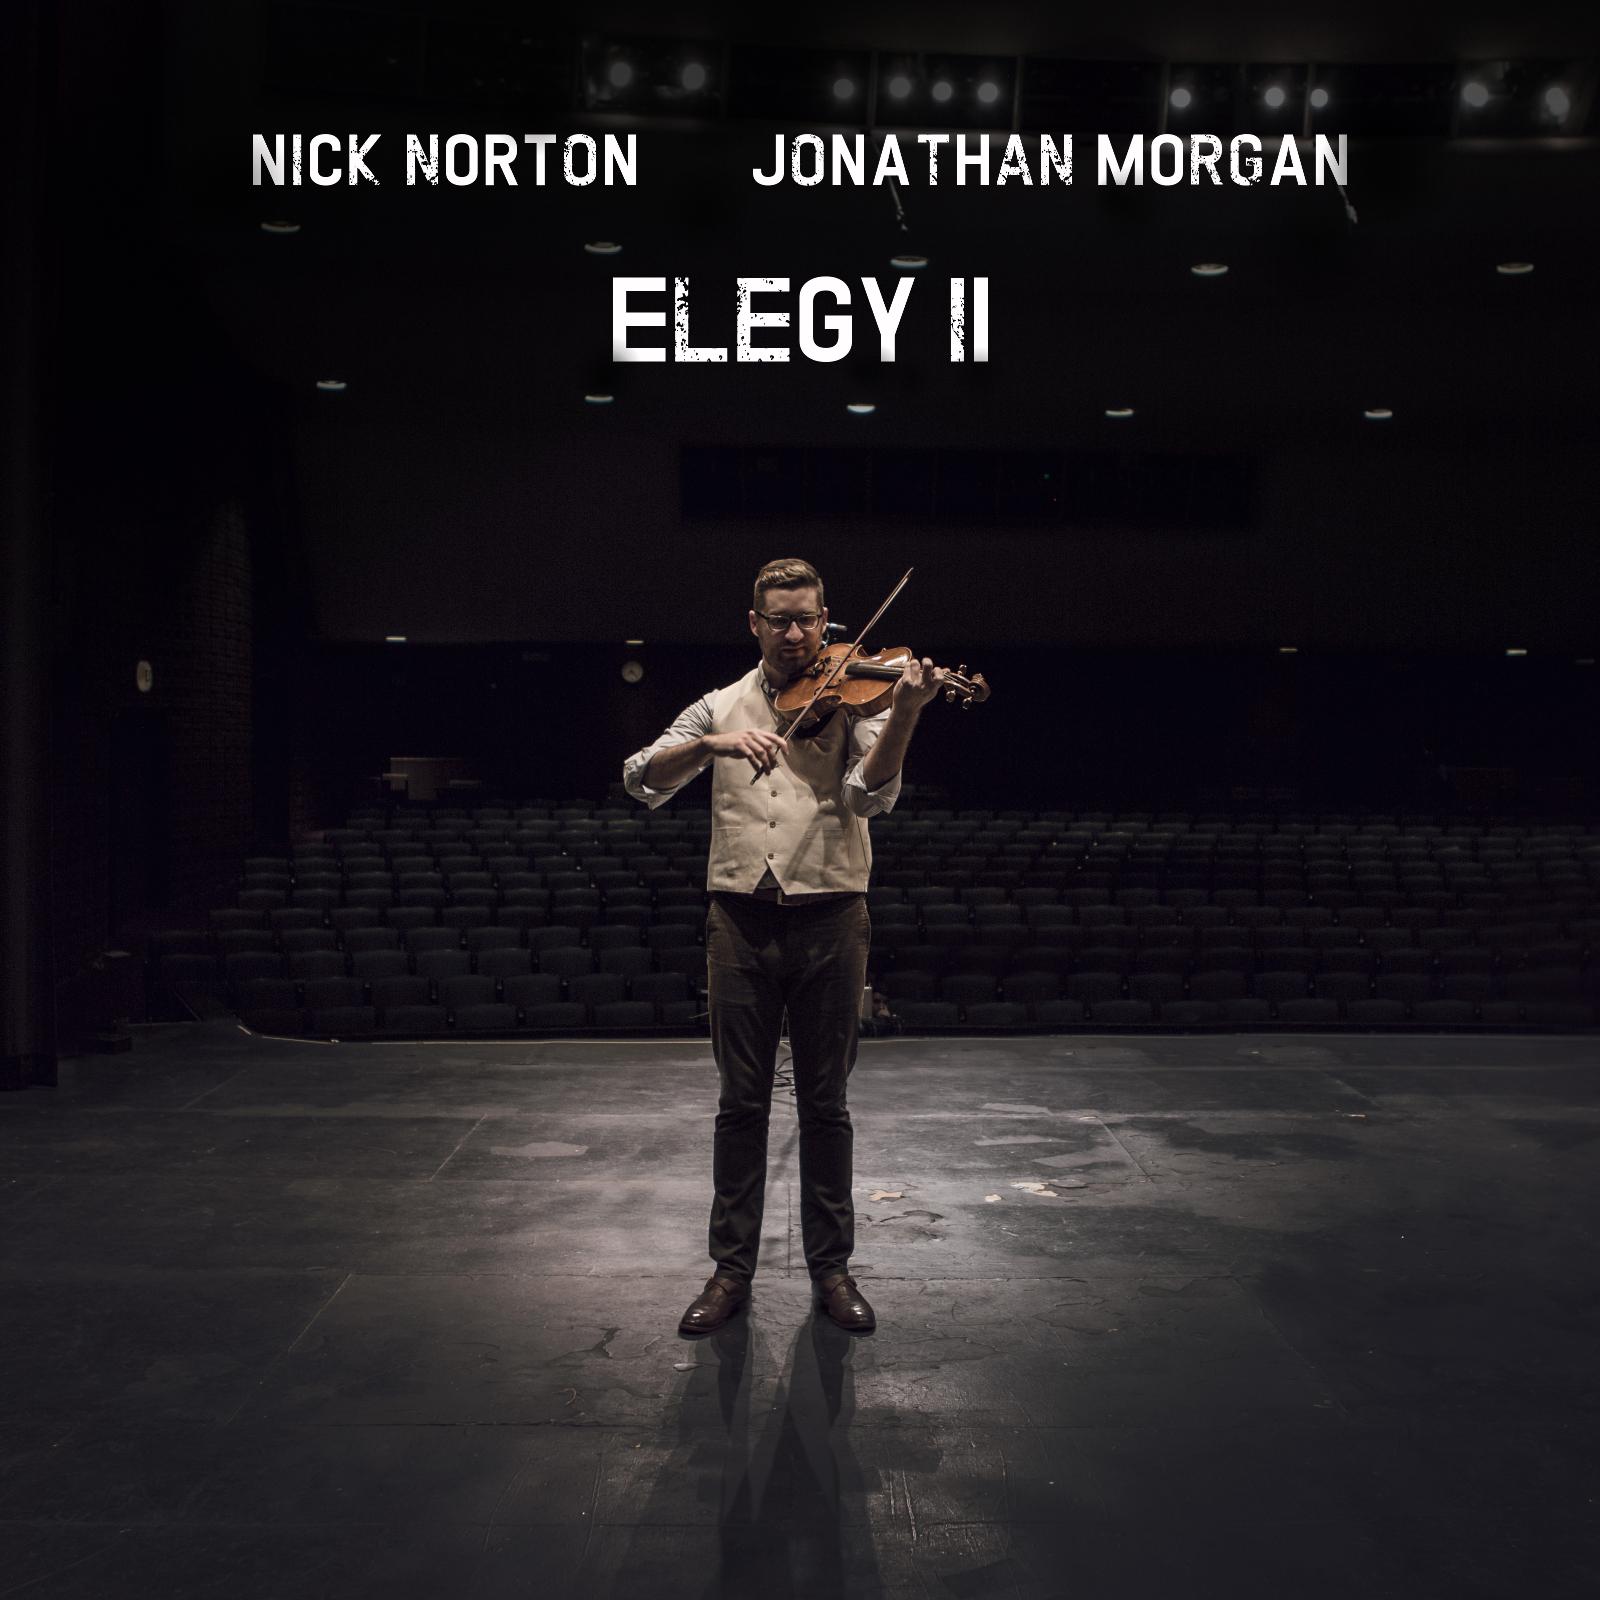 Elegy II by Nick Norton & Jonathan Morgan